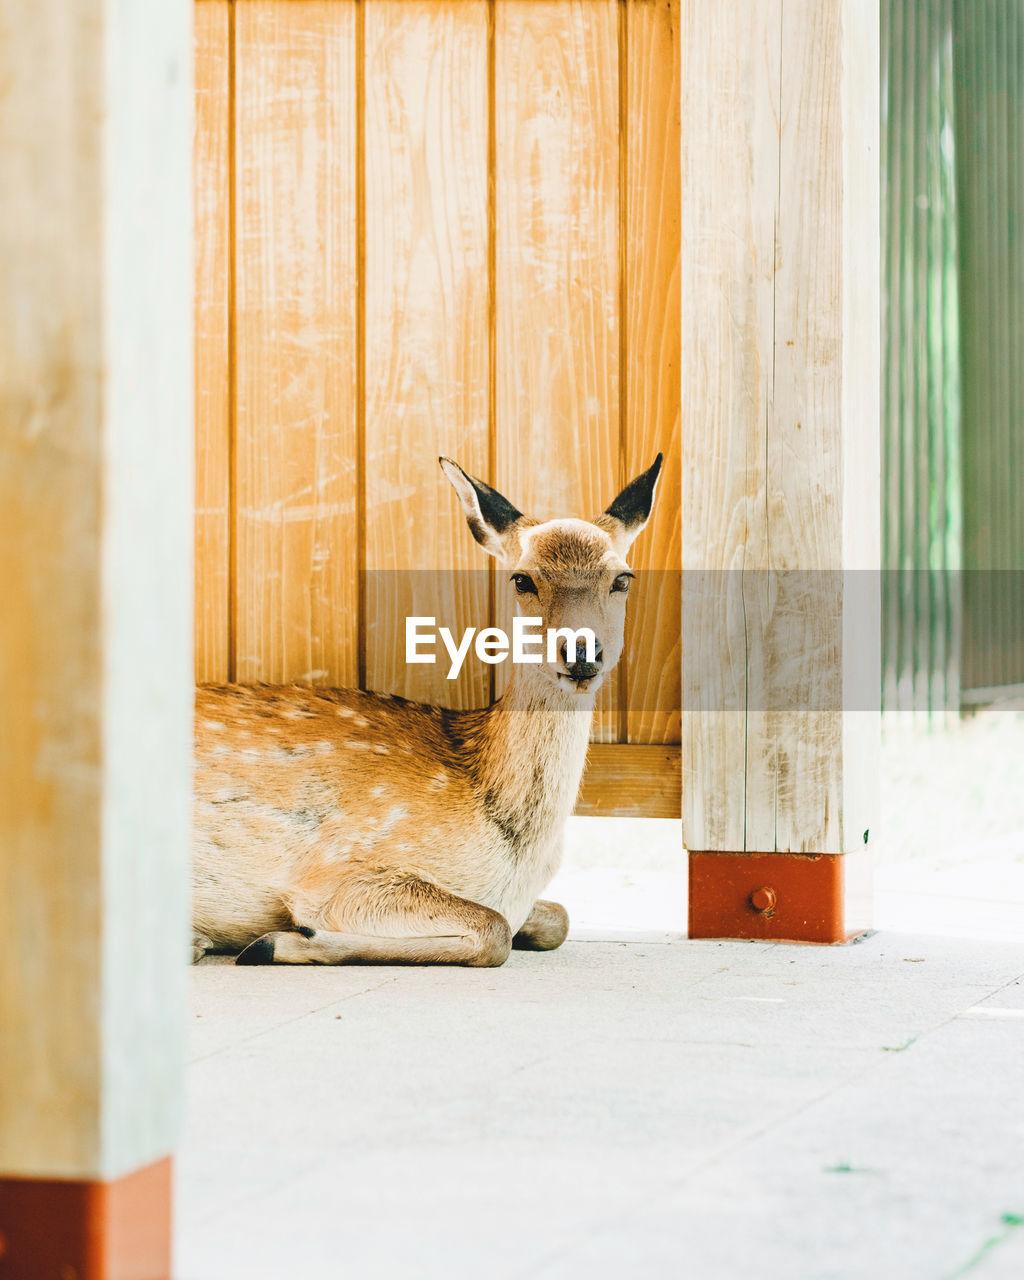 Portrait Of Deer Sitting By Wooden Wall